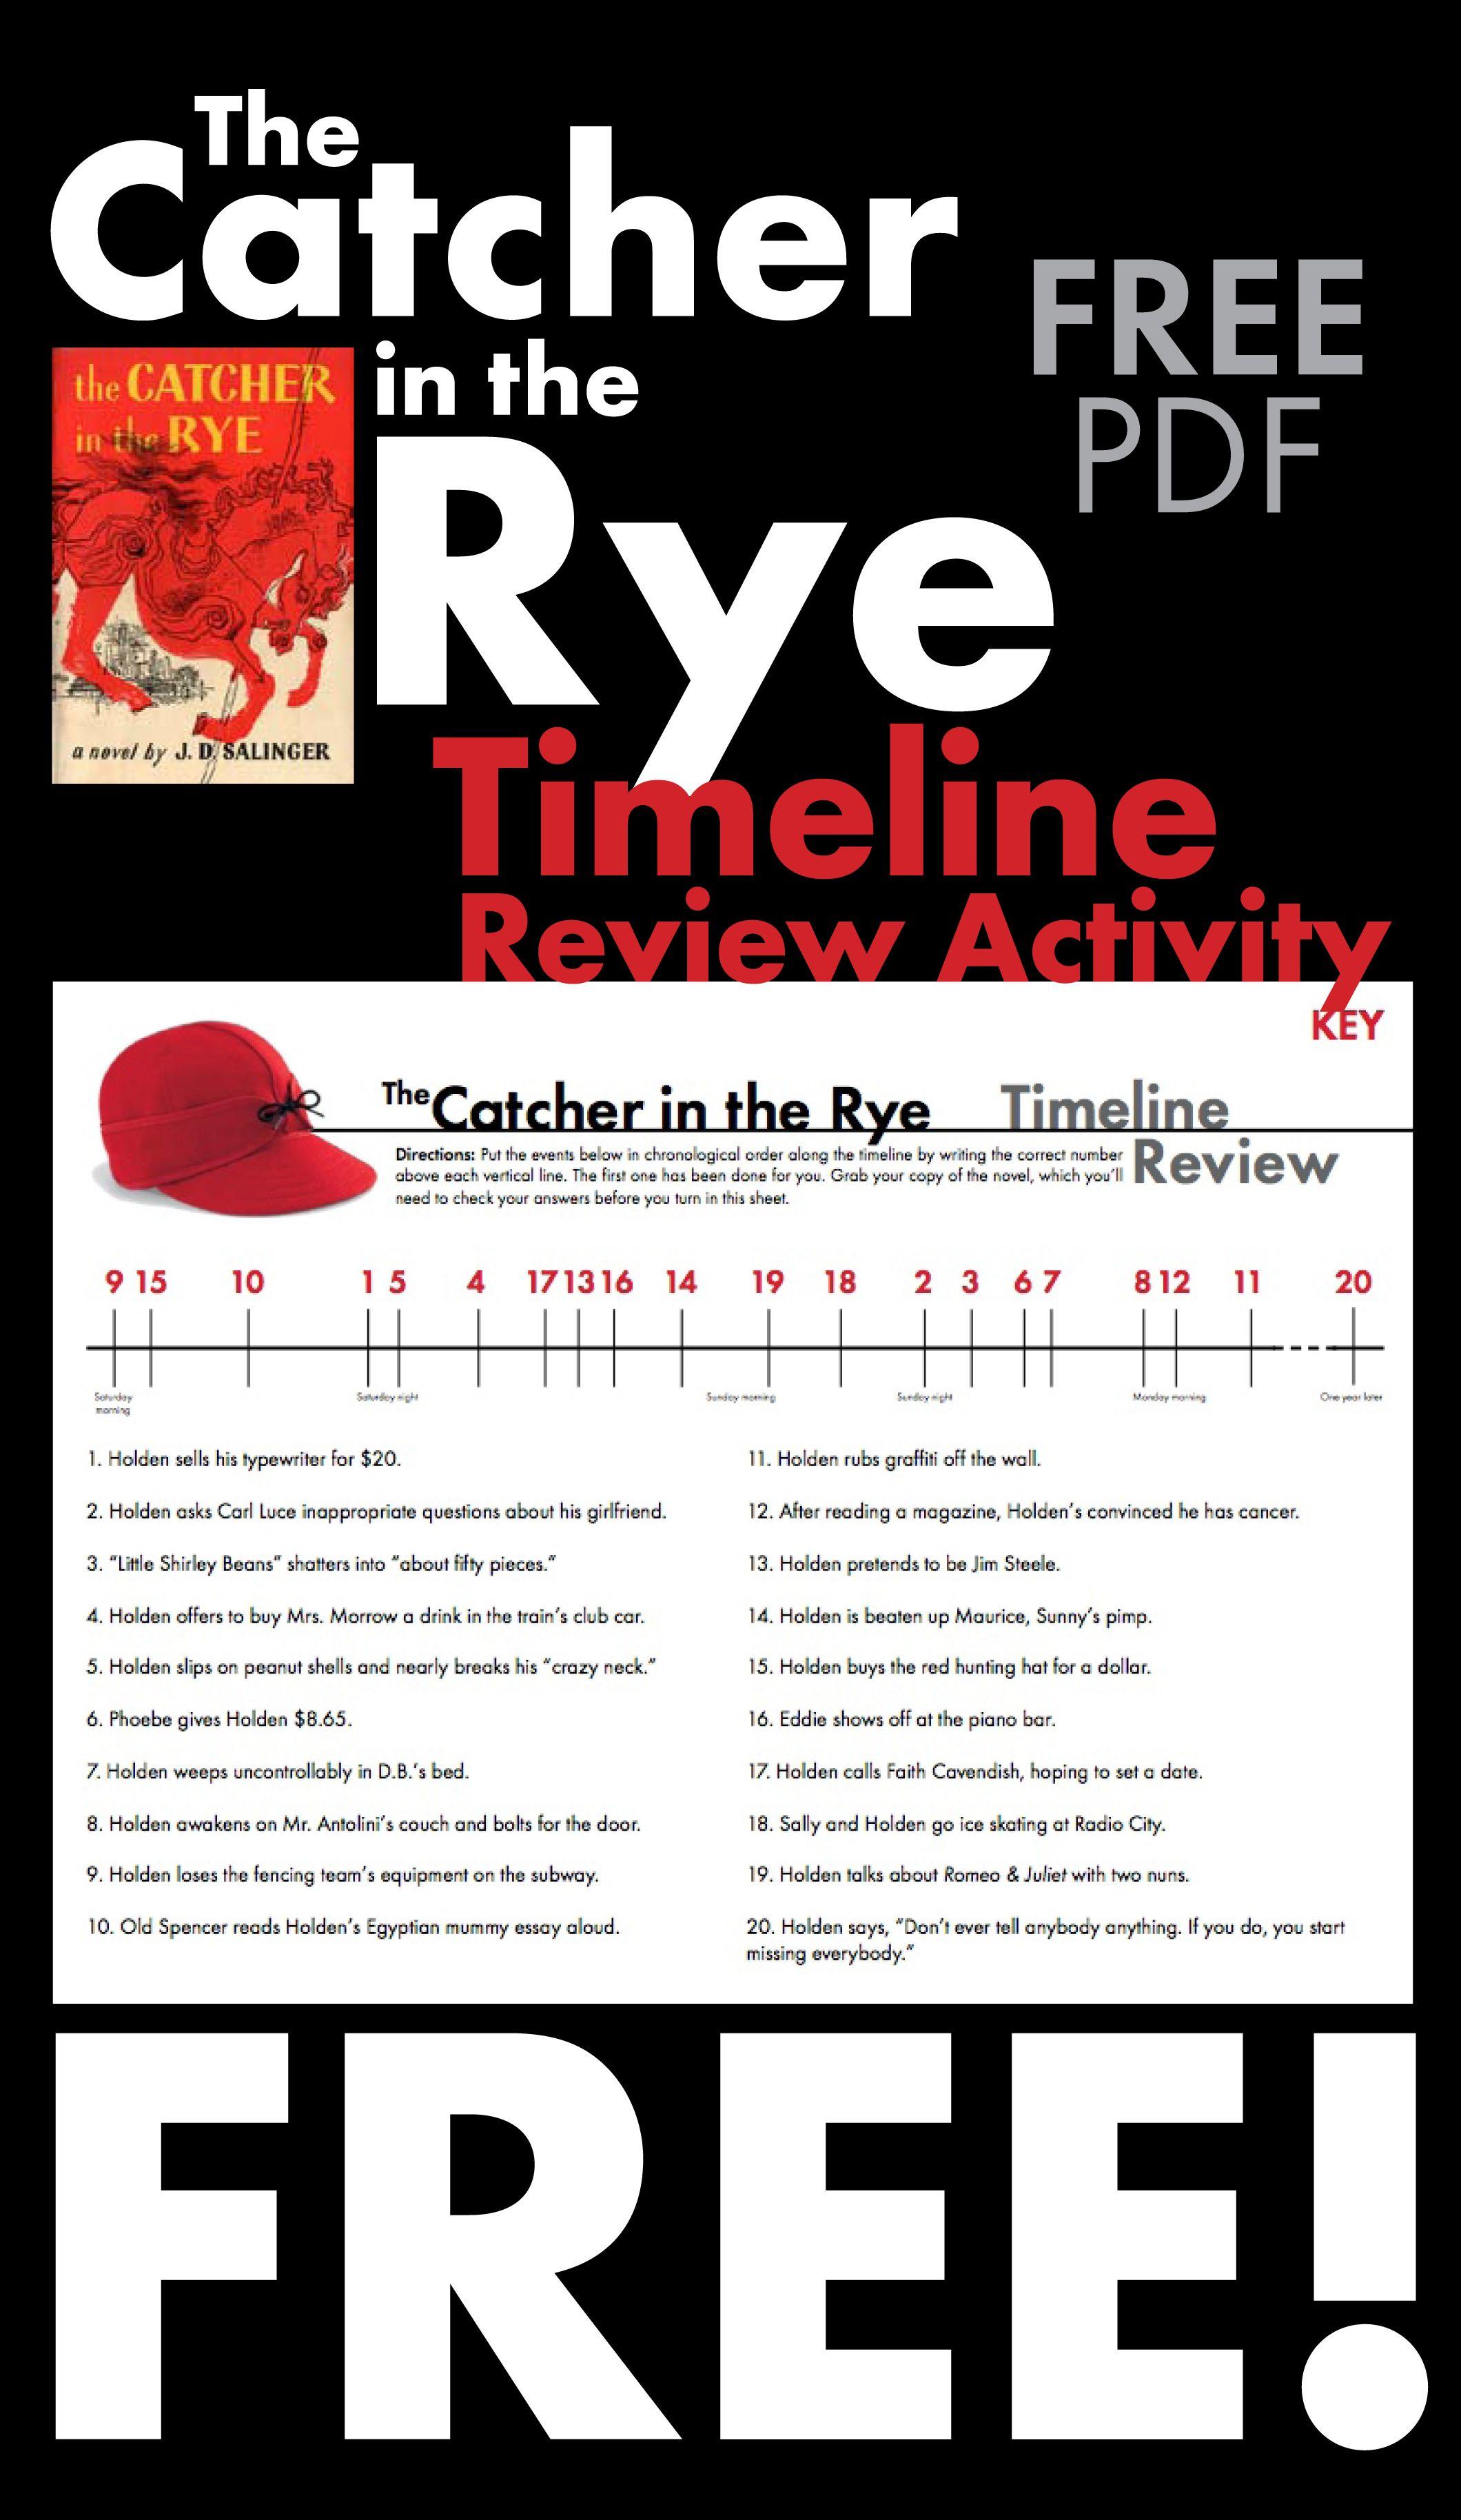 Worksheets Catcher In The Rye Worksheets Cheatslist Free Worksheets For Kids Amp Printable